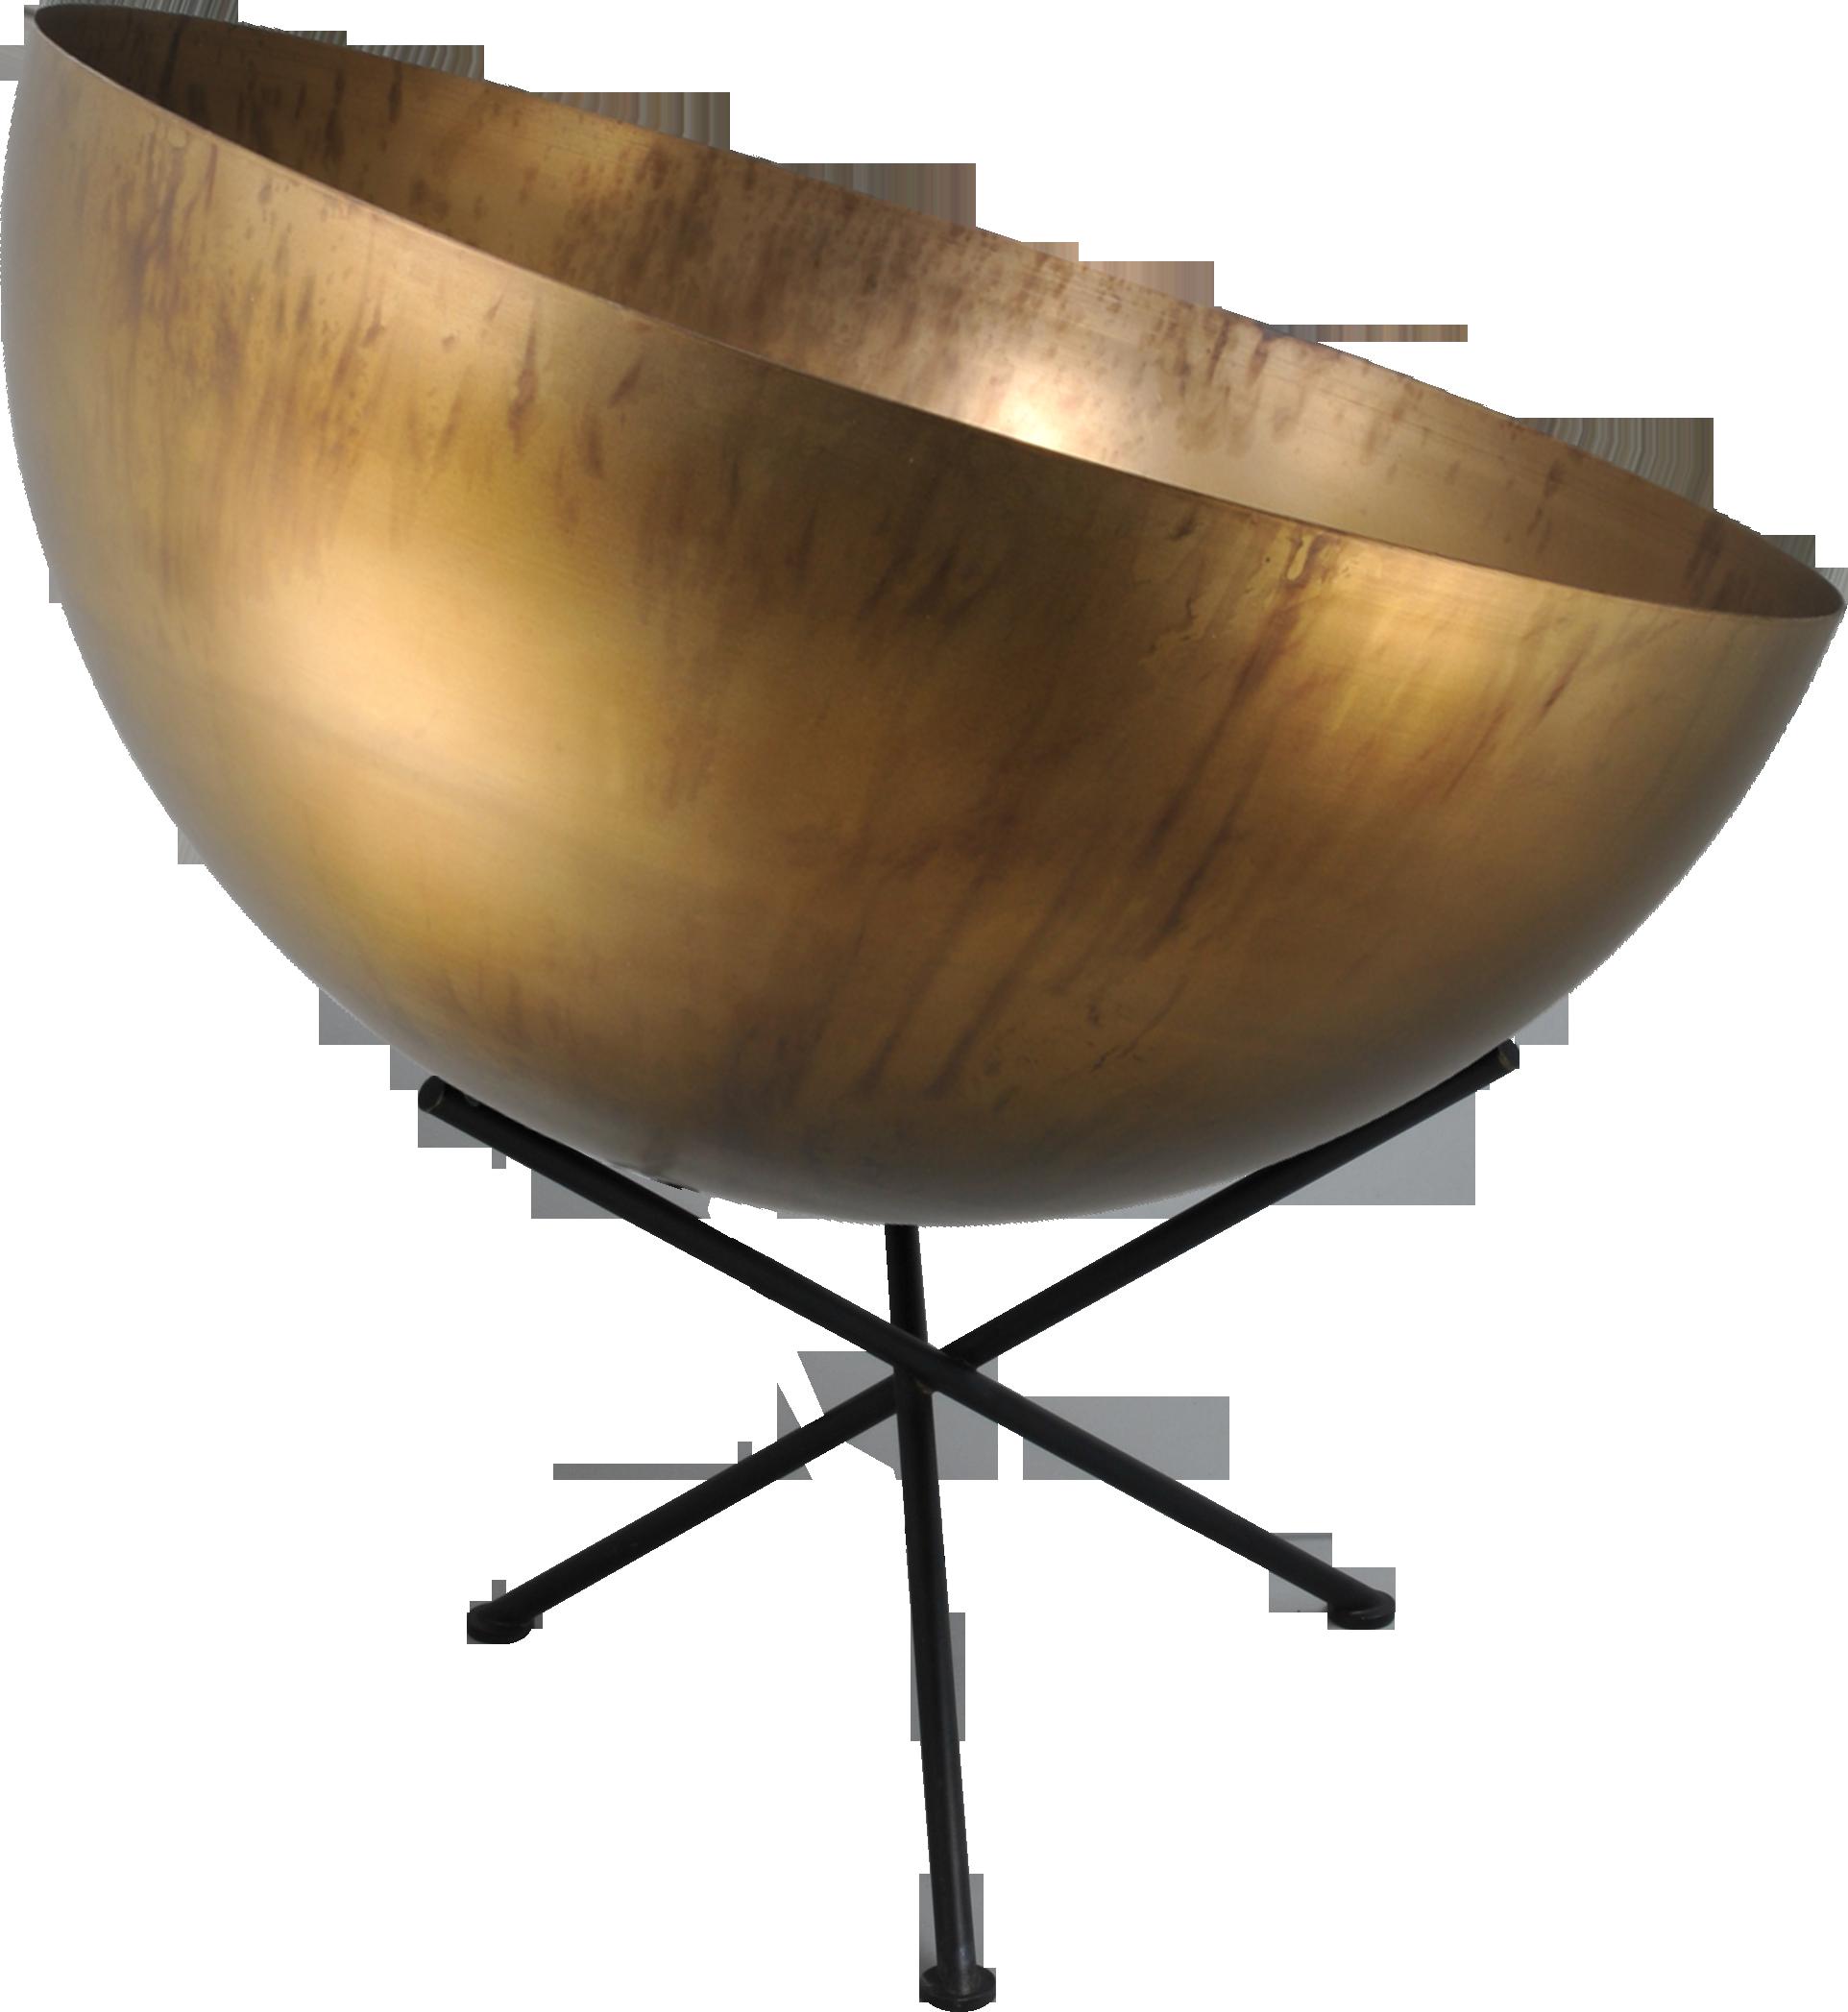 Larino Antique Brass TL LARINO D.50CM AGED BRASS EXTERIOR E27